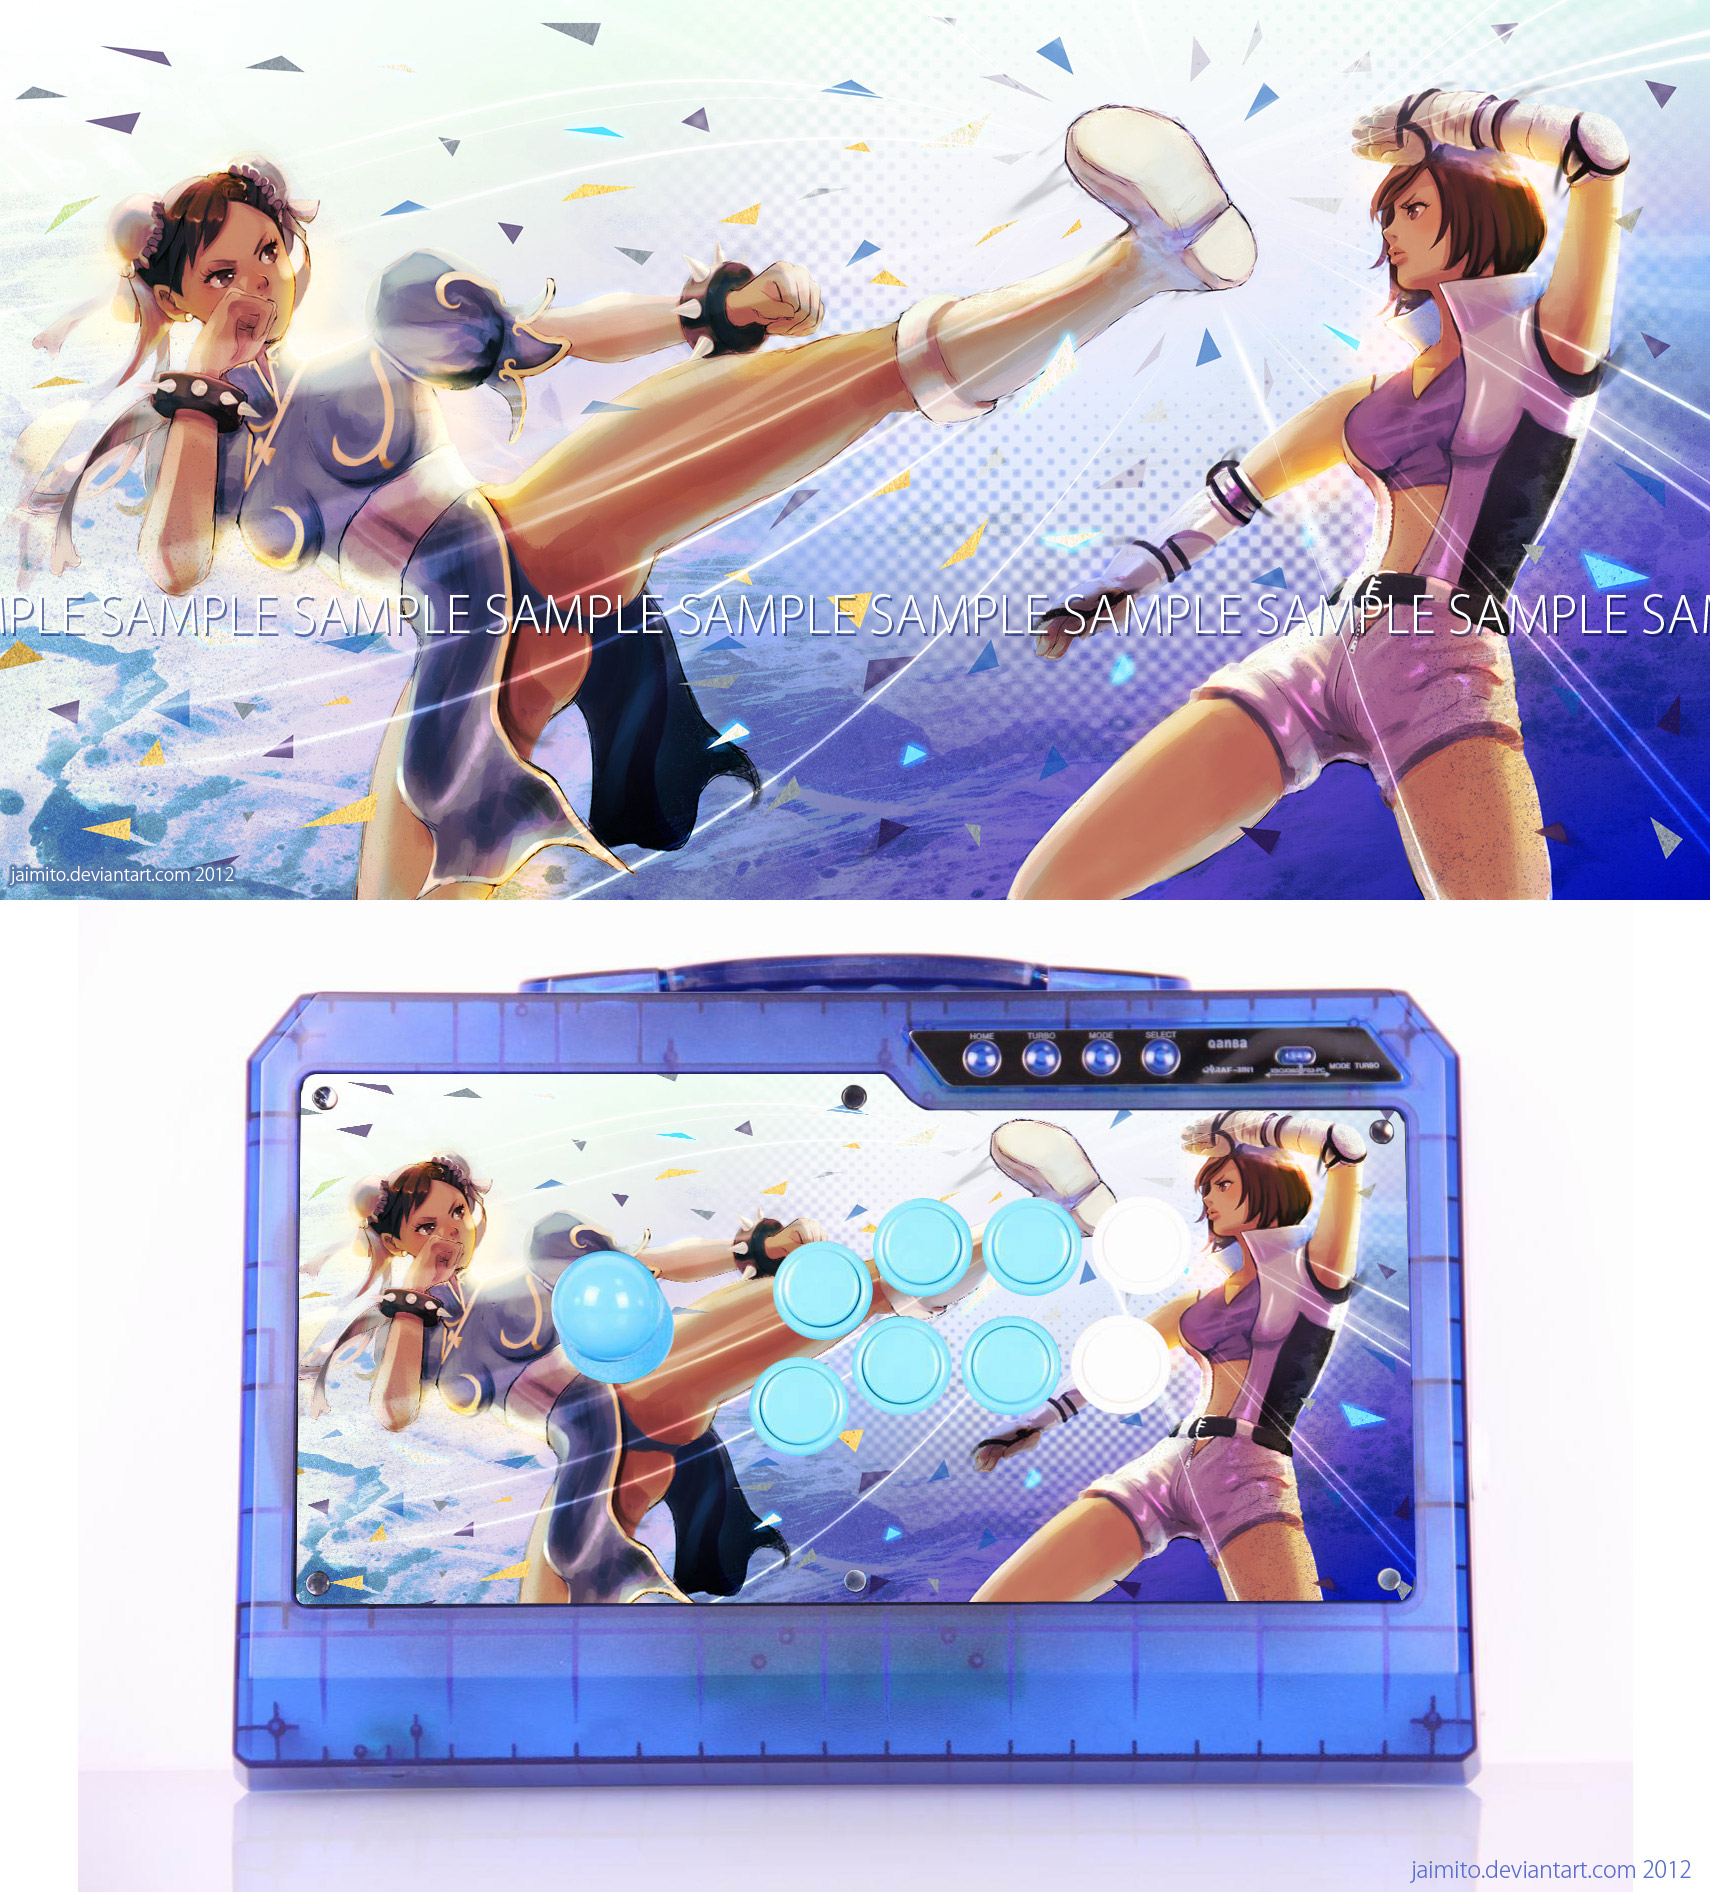 Chun-Li VS Asuka Arcade Stick